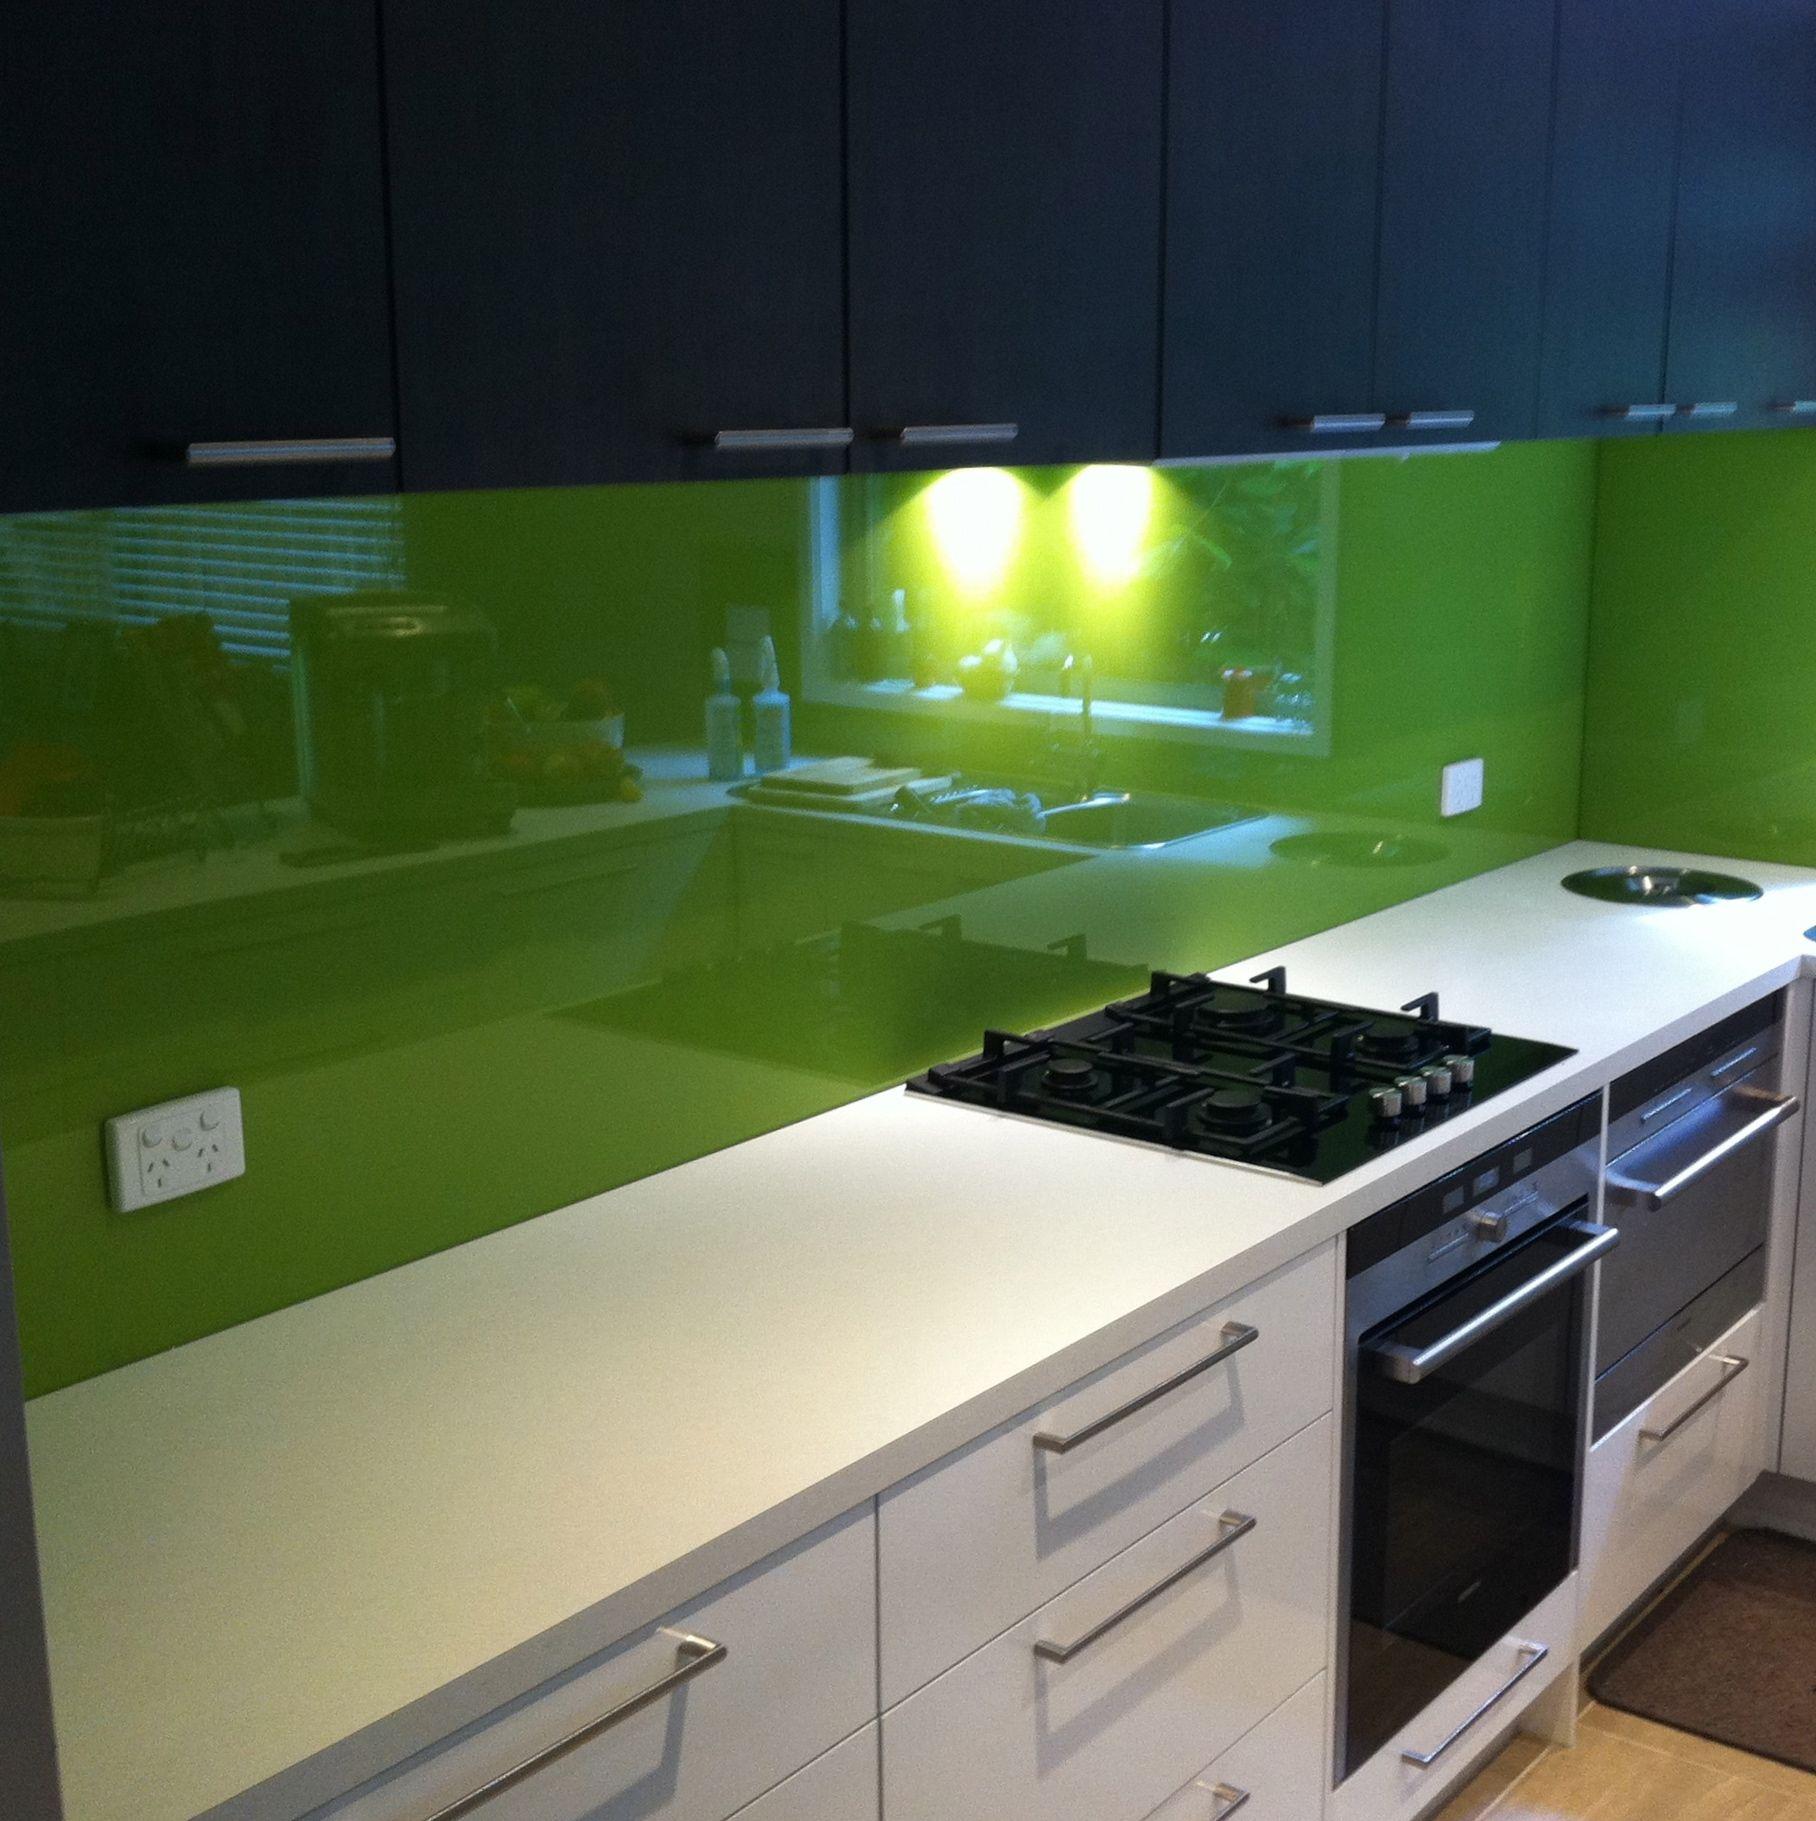 Glass Kitchen Designs: Bright Green Glass Splashbacks! #kitchensplashbacks #green